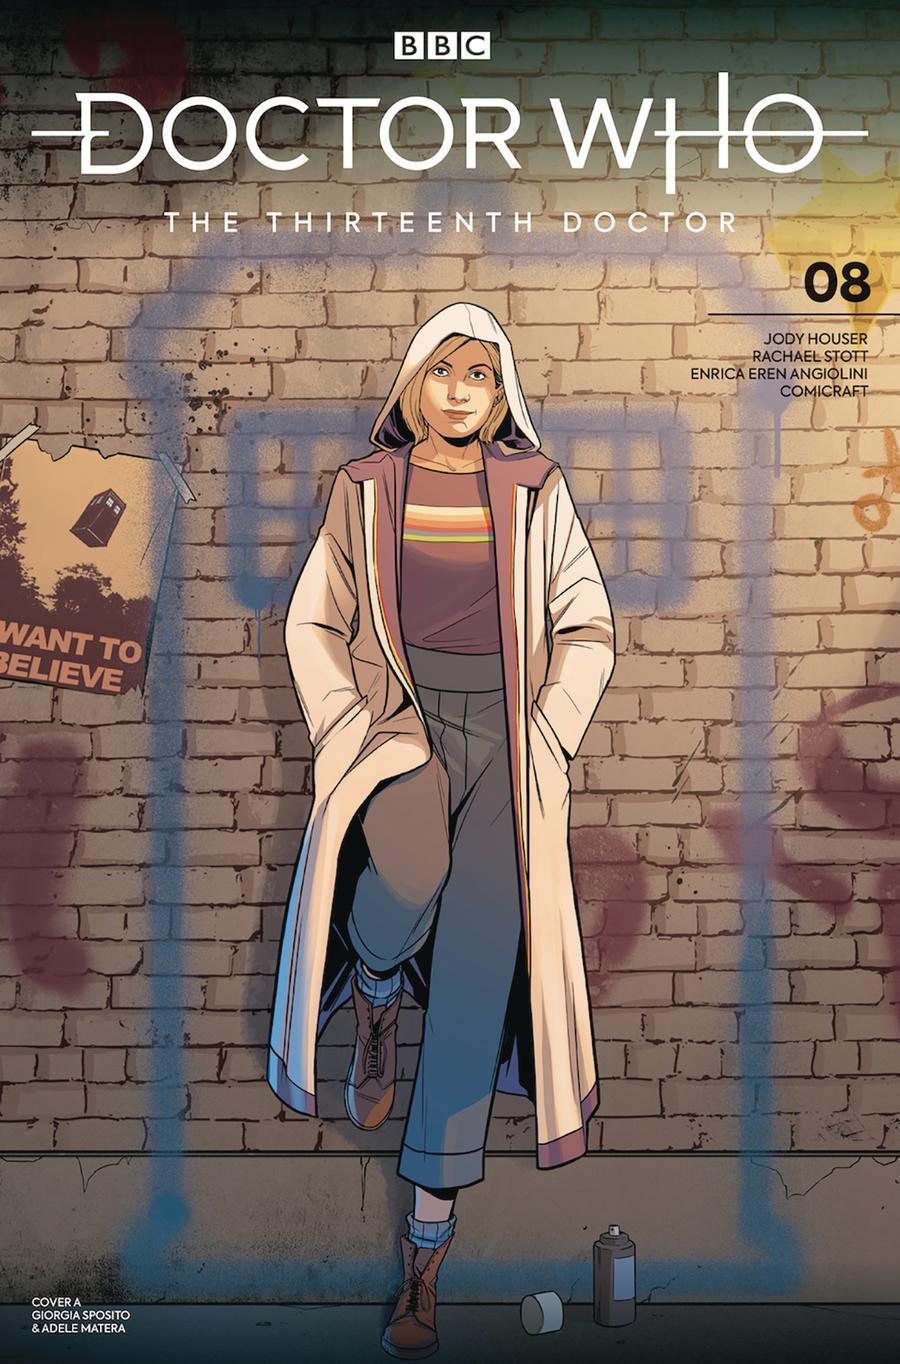 Doctor Who 13th Doctor #8 Cover A Regular Giorgia Sposito Cover